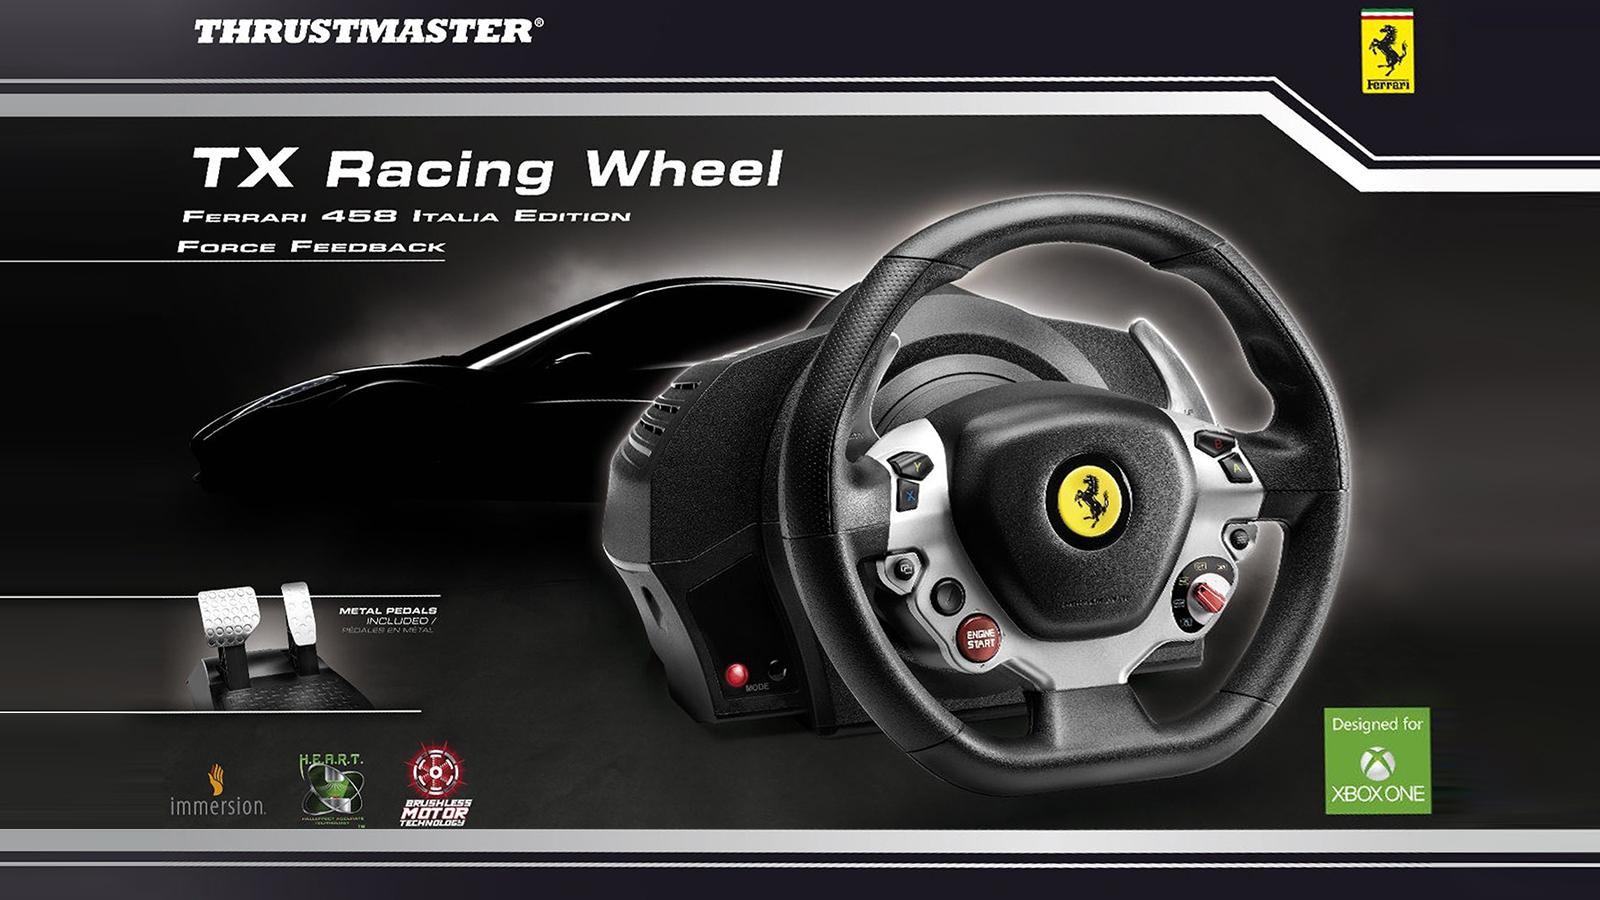 xbw thrustmaster tx racing wheel. Black Bedroom Furniture Sets. Home Design Ideas